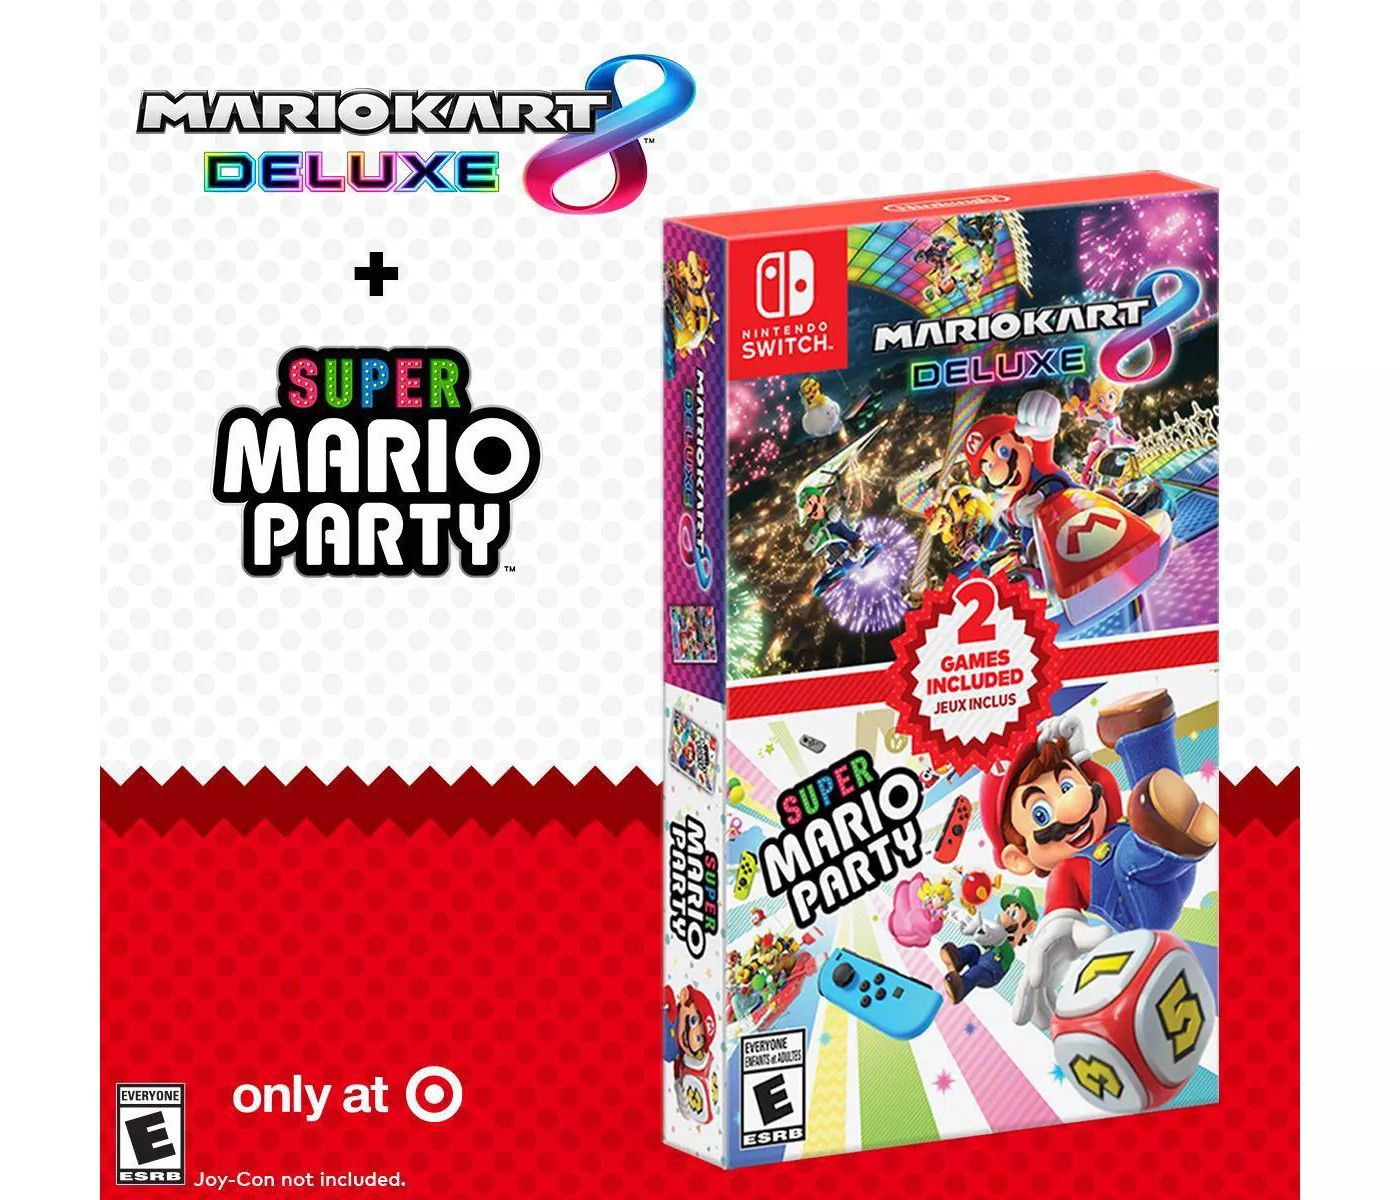 Target Announces Exclusive Mario Kart 8/Super Mario Party Bundle |  Xenocell.com